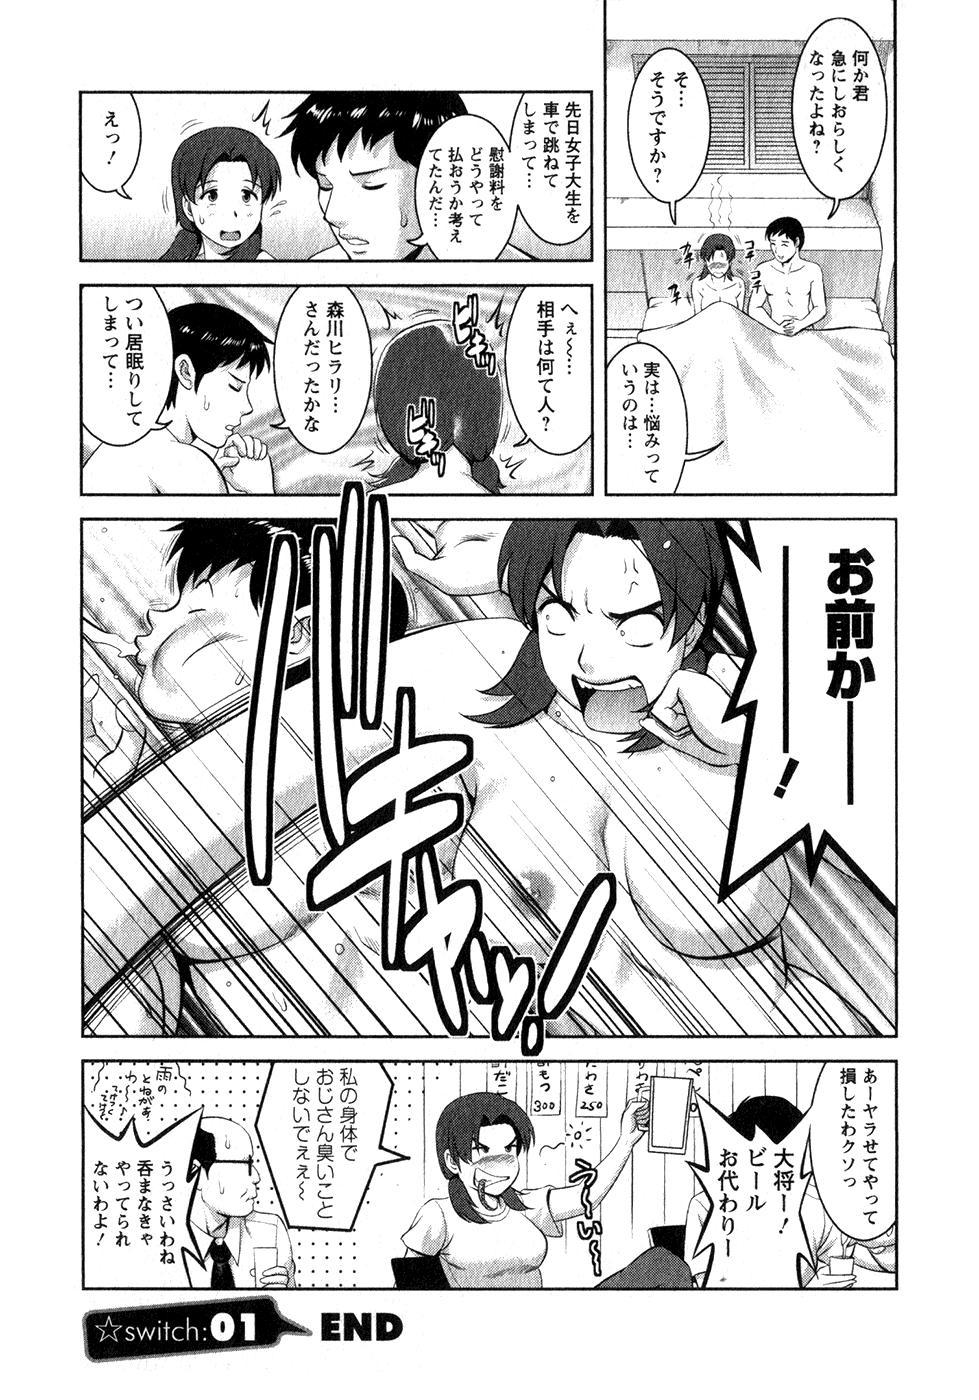 [Saigado] Kururi-san to Hirari-san Vol. 1 (Complete) 24